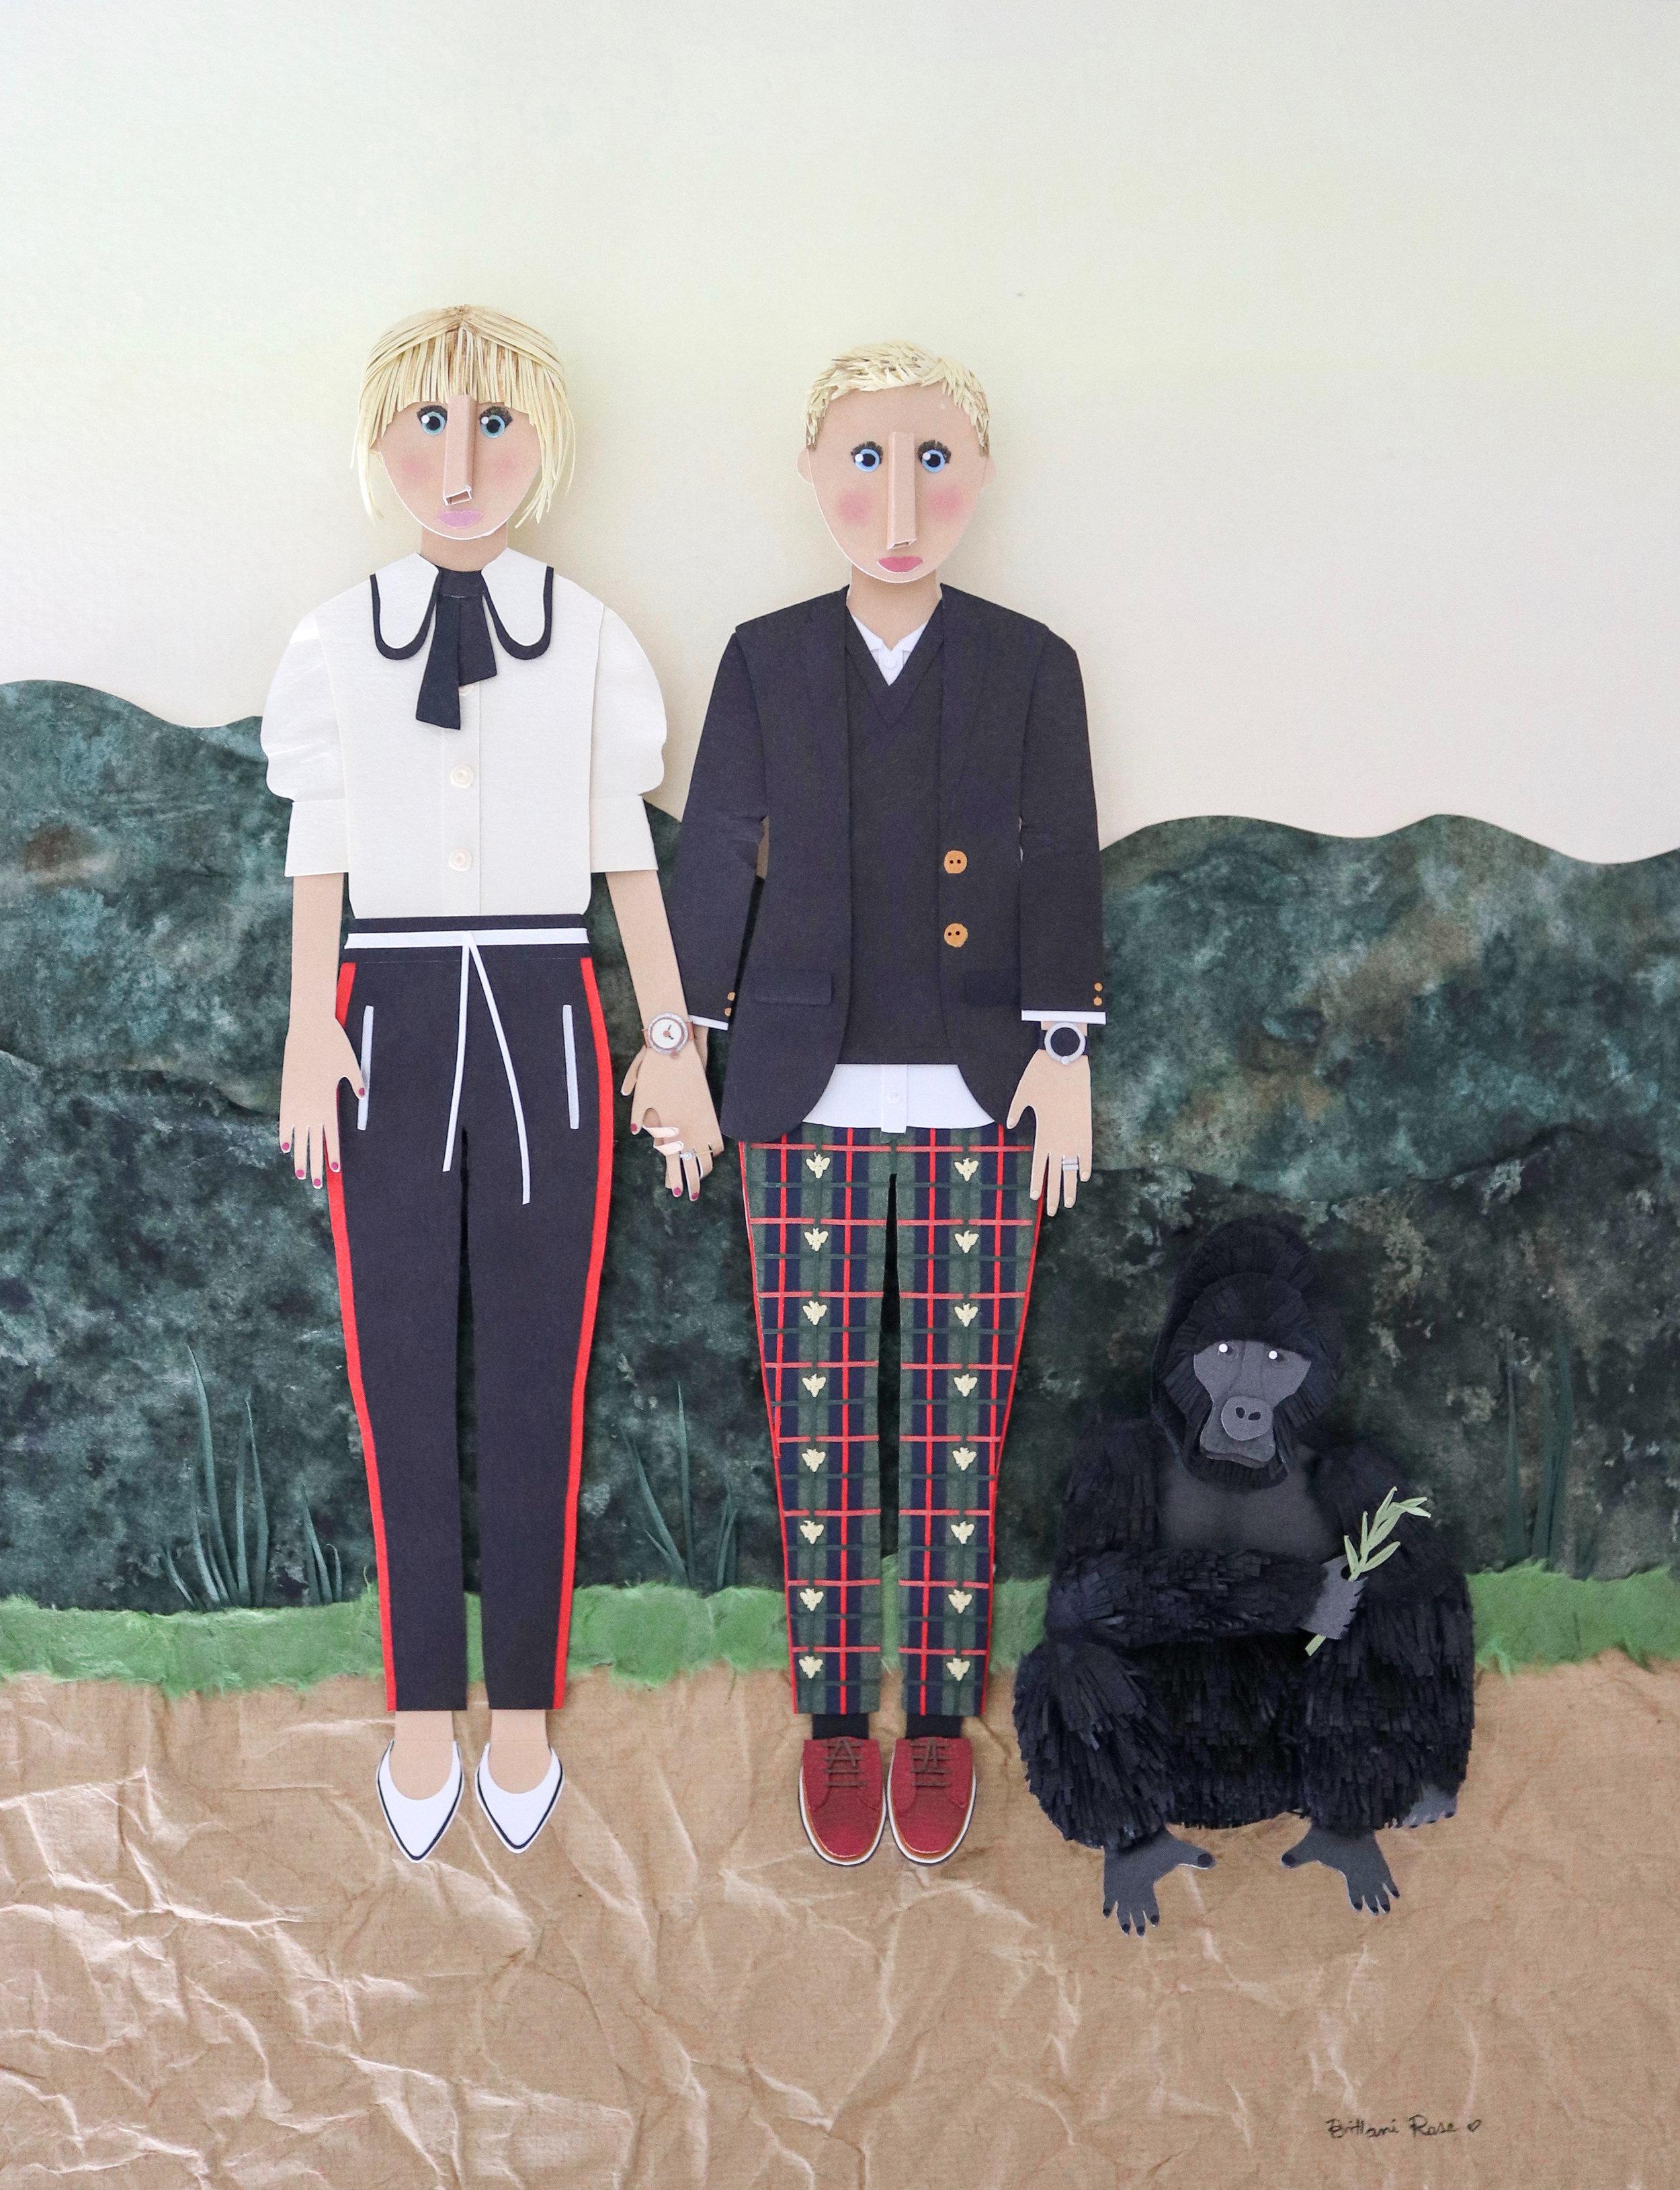 Custom portrait made from paper of Ellen DeGeneres and Portia de Rossi